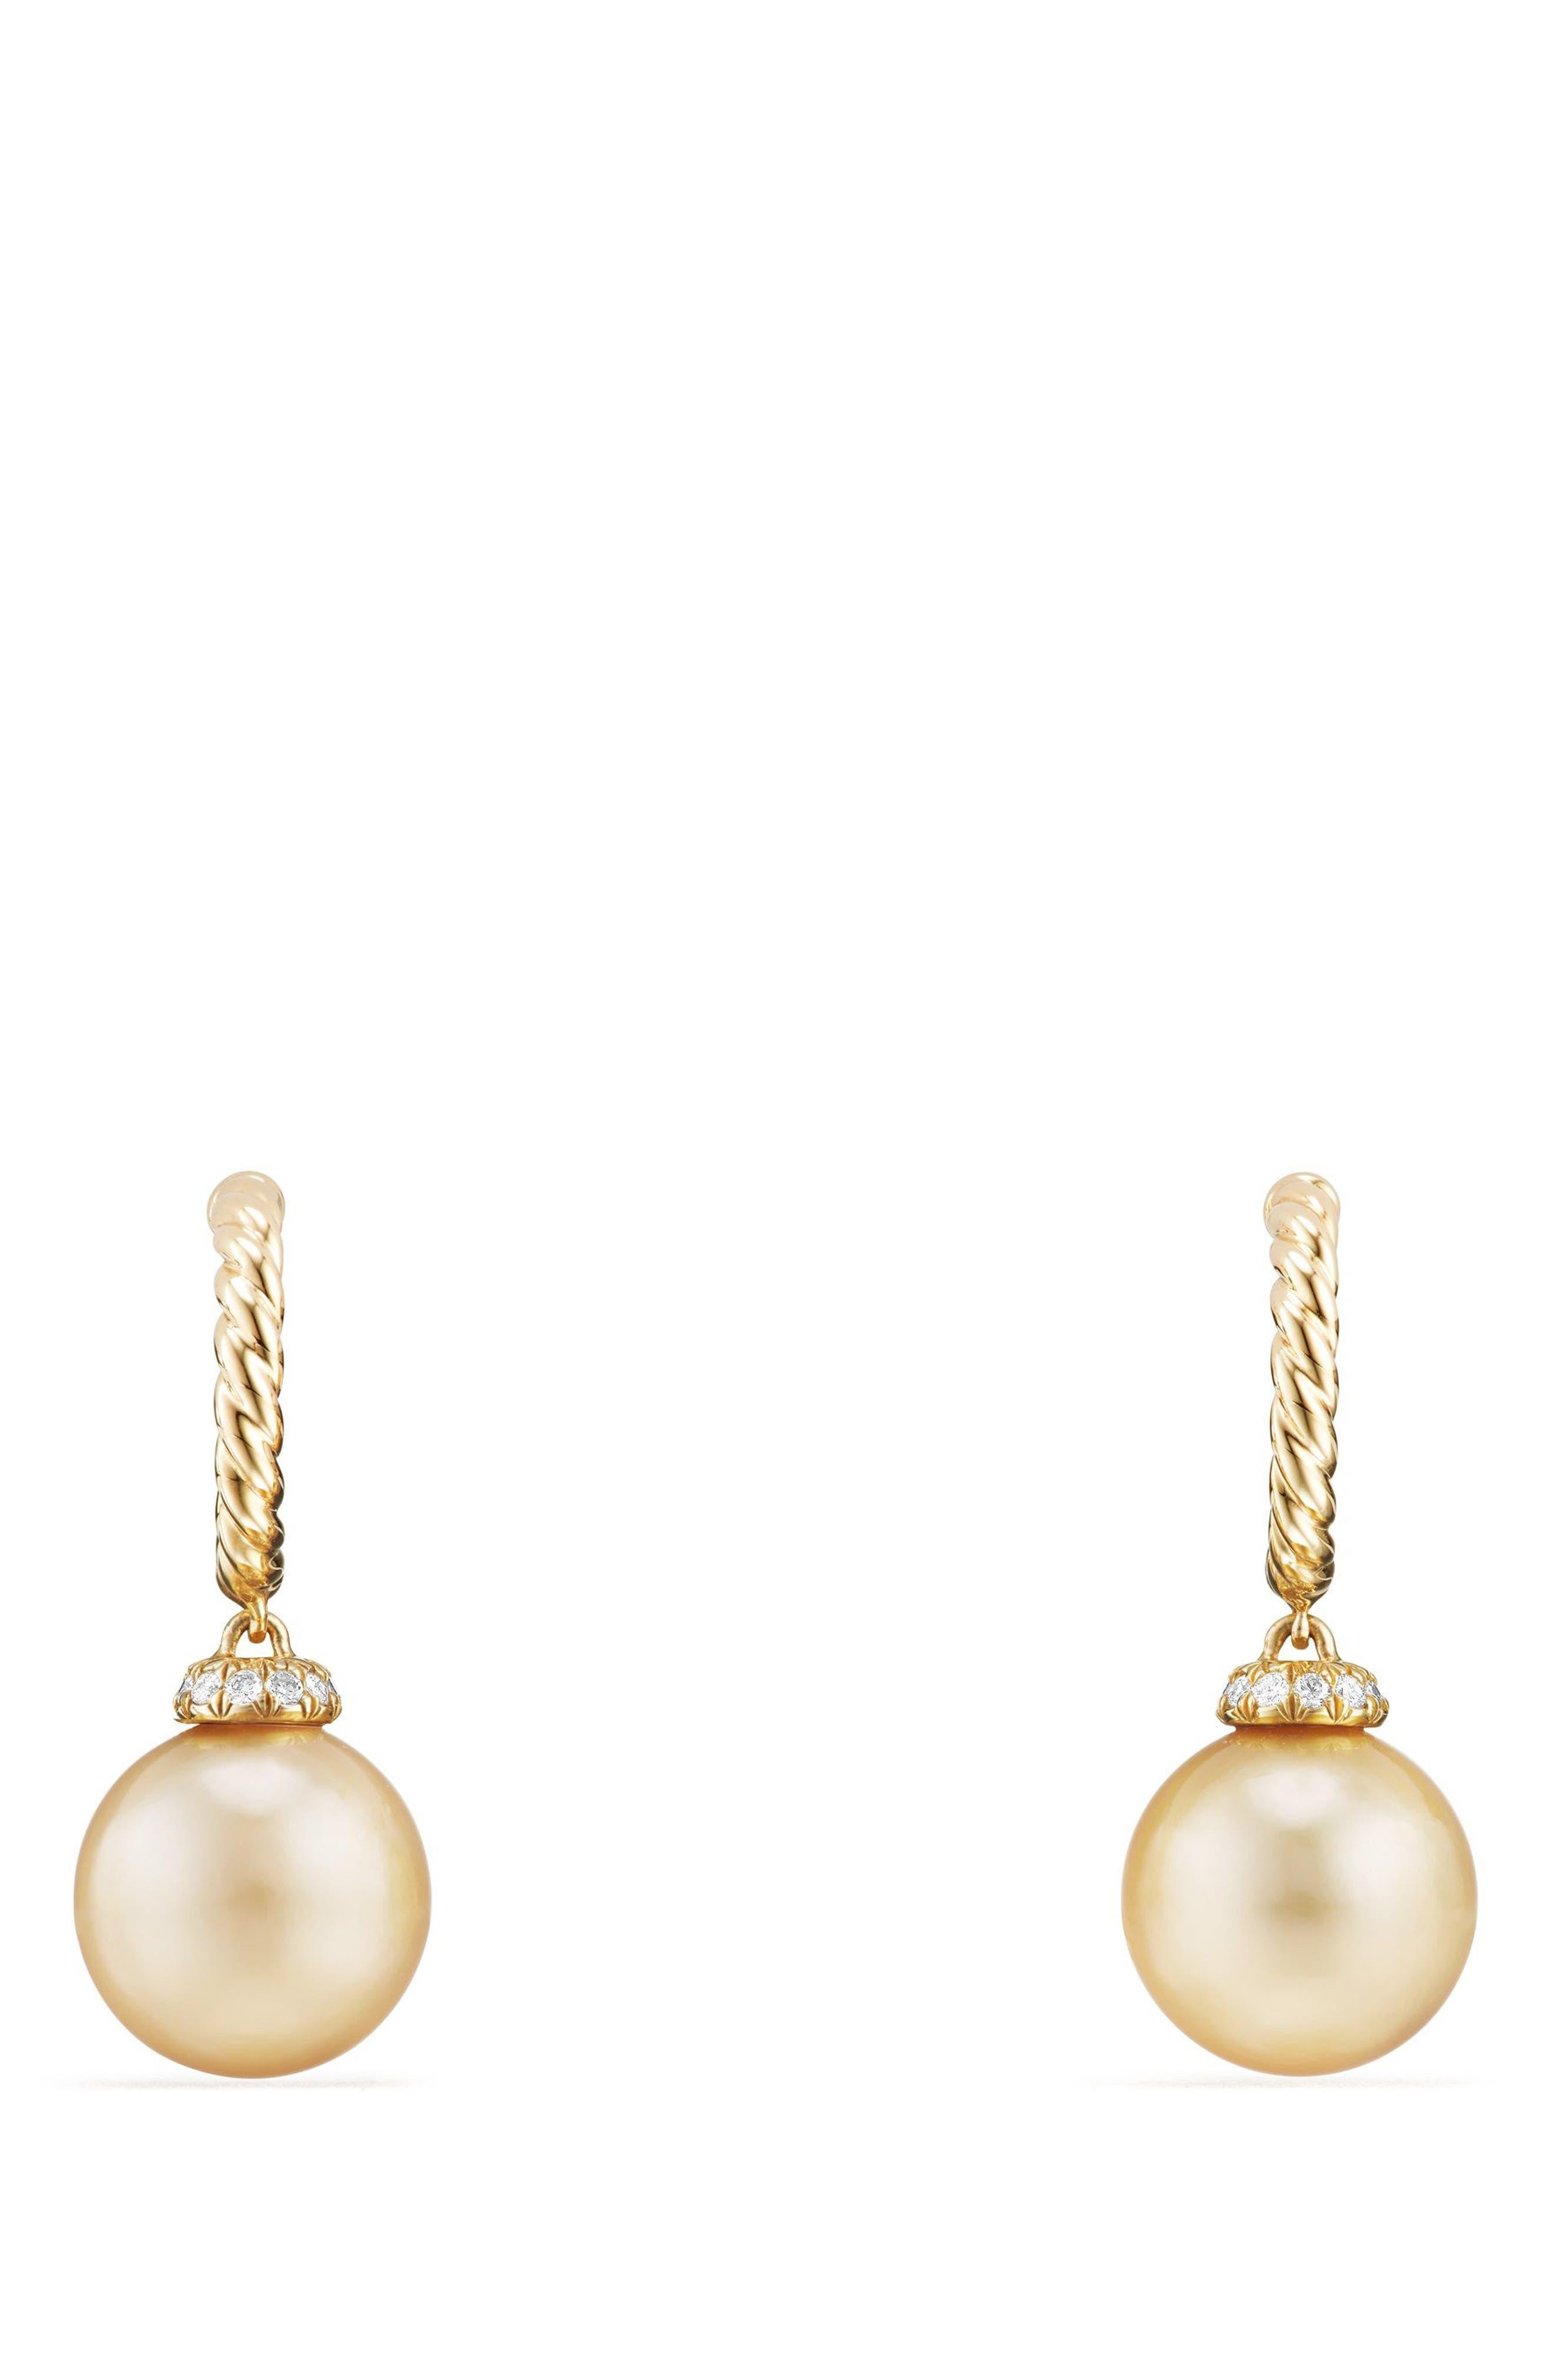 Main Image - David Yurman Solari Hoop Earrings with Diamonds and Genuine Pearl